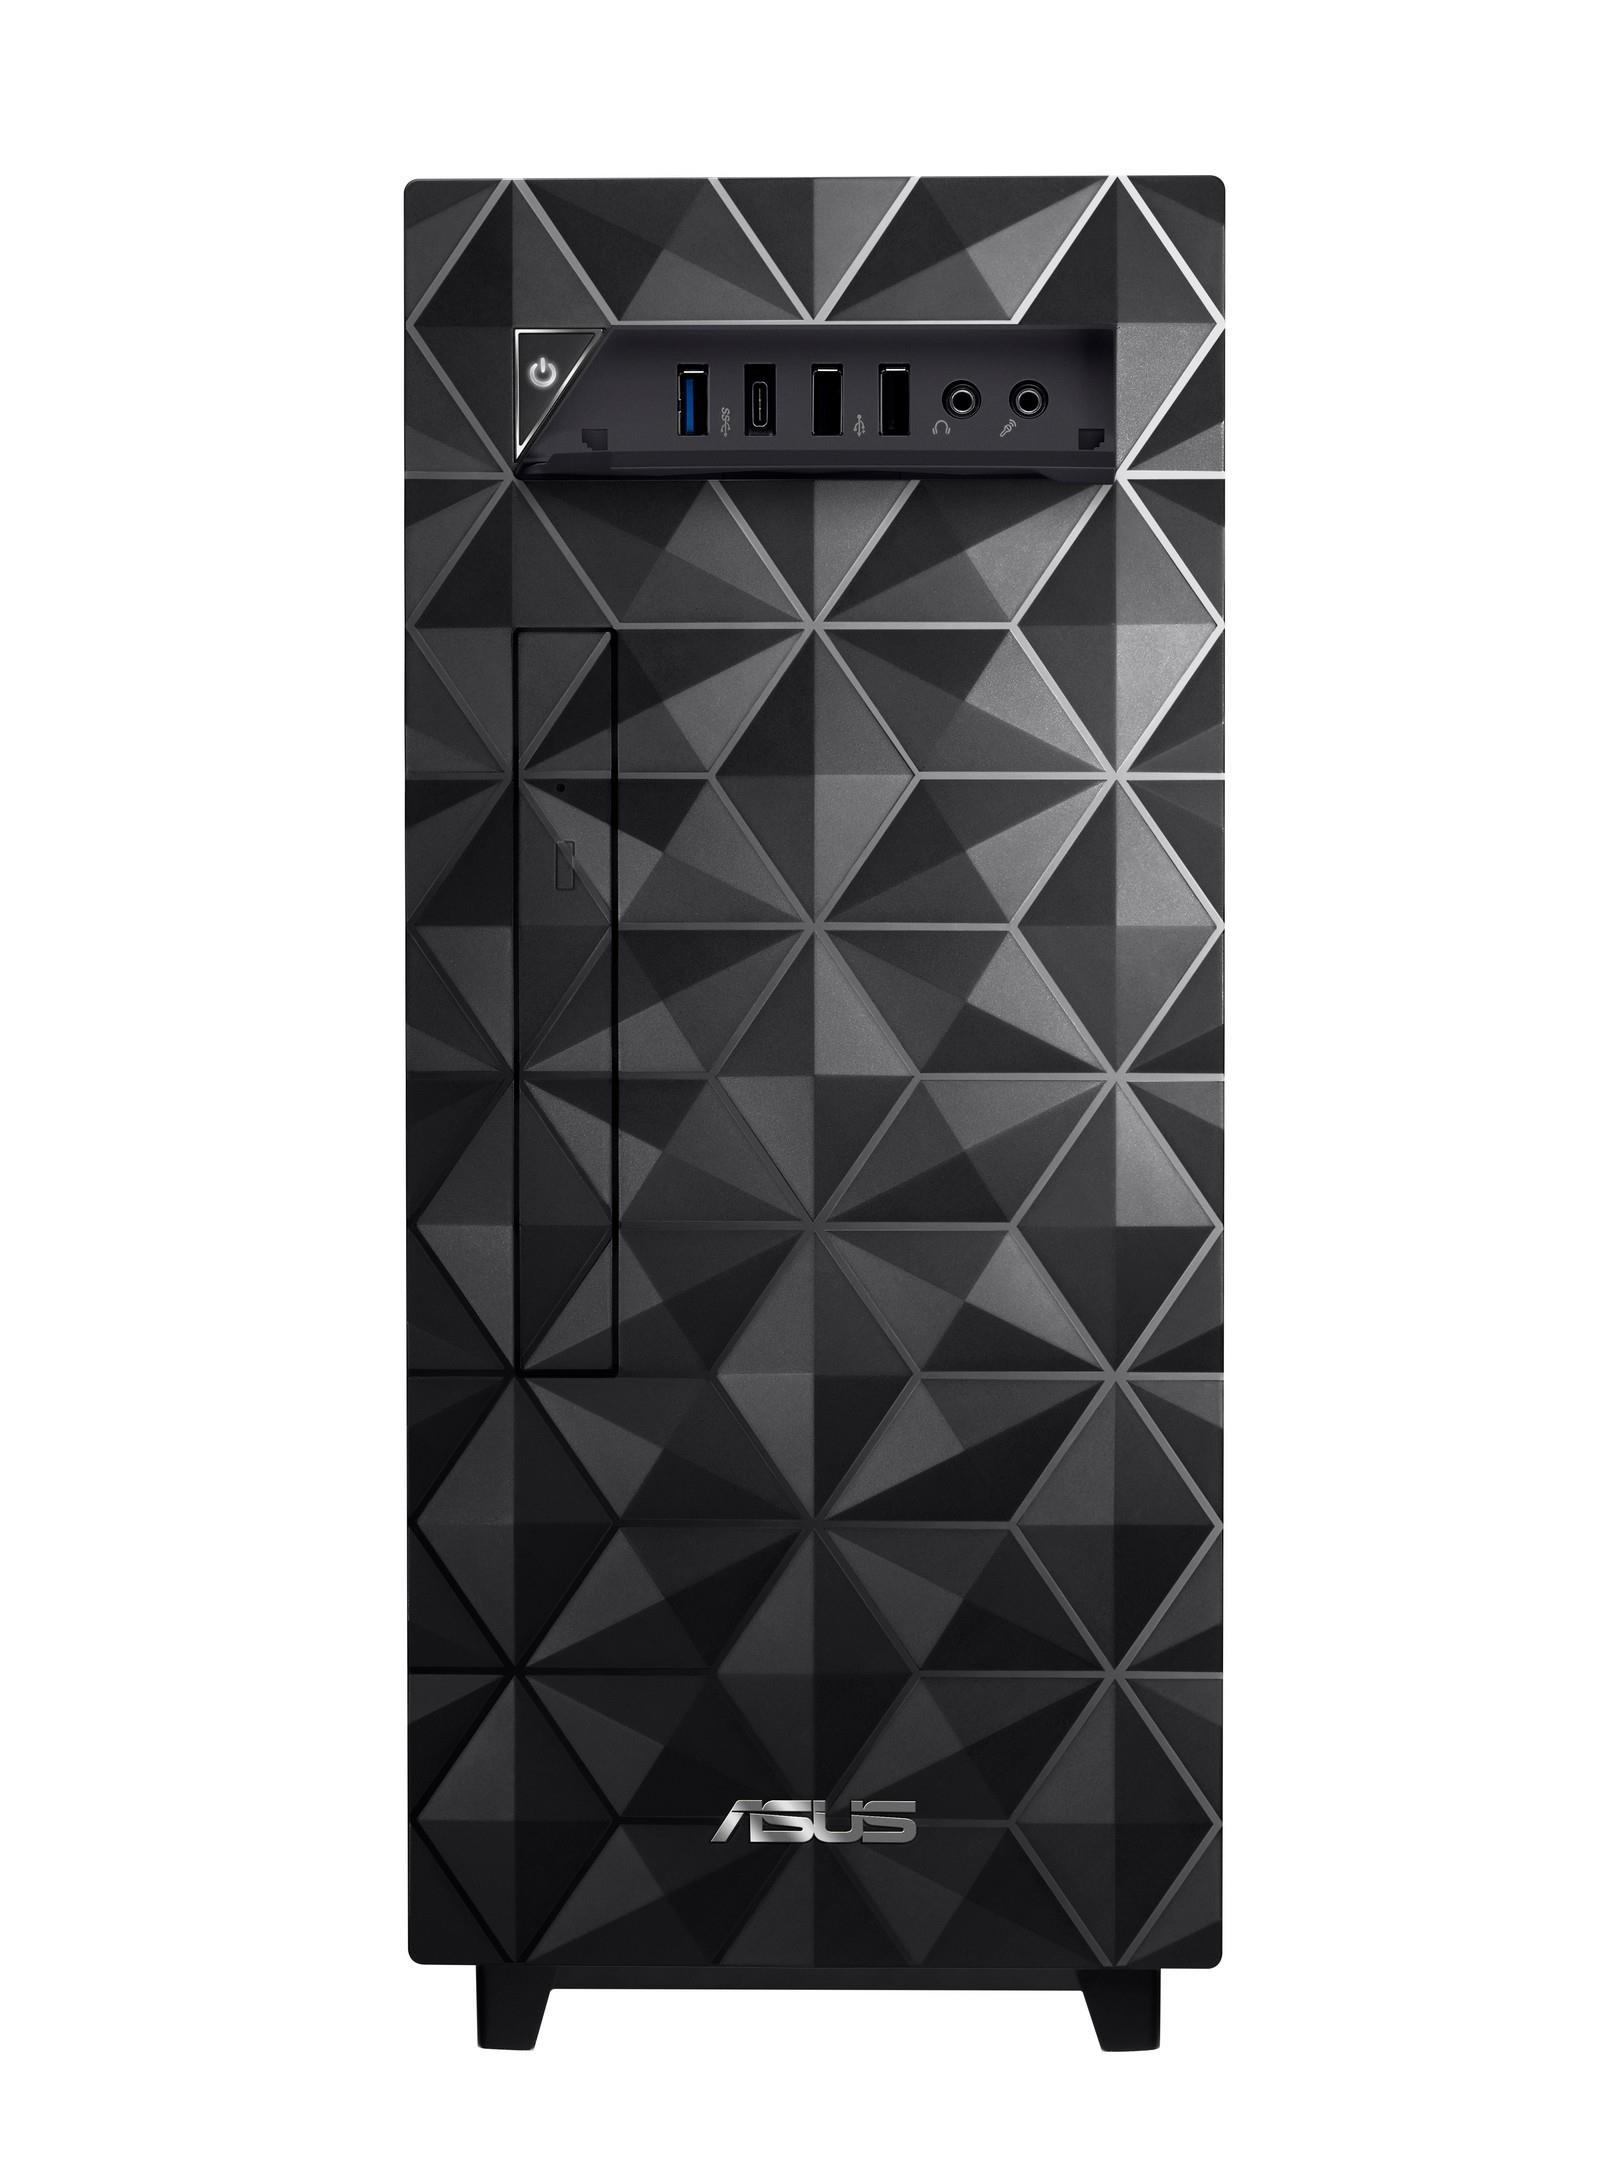 ASUS ExpertCenter S300MA/i5-10400 (6C/12T)/8GB/256GB SSD/GTX1650 4G/NoOS/Black/3Y PUR - S300MA-5104000260